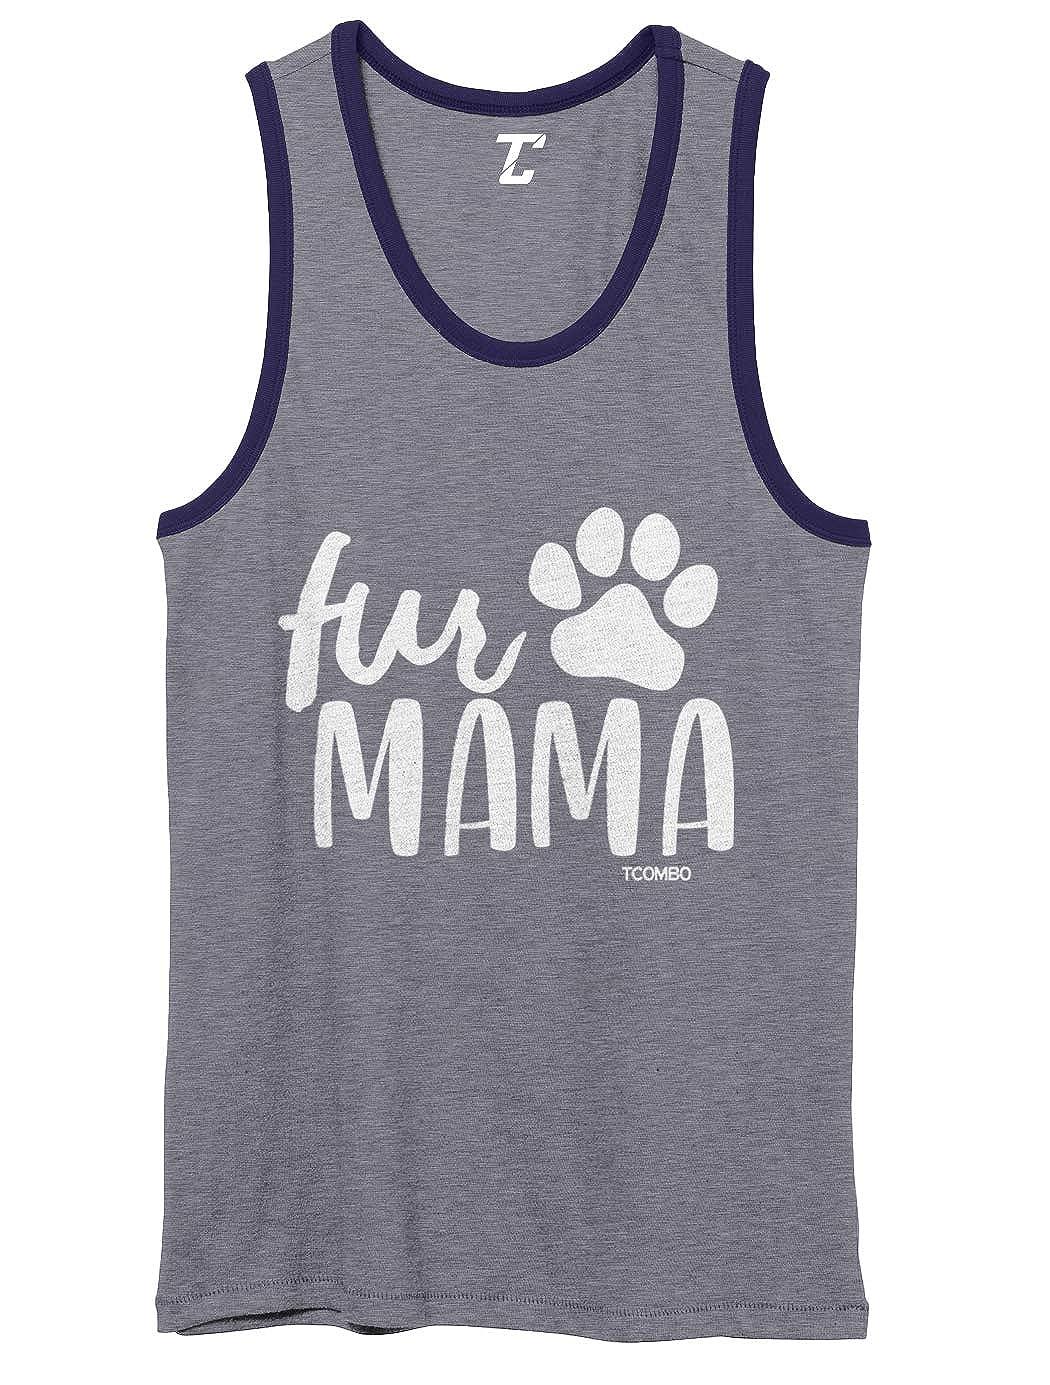 Dog Cat Pet Owner Mom Mother Unisex 2-Tone Tank Top Fur Mama